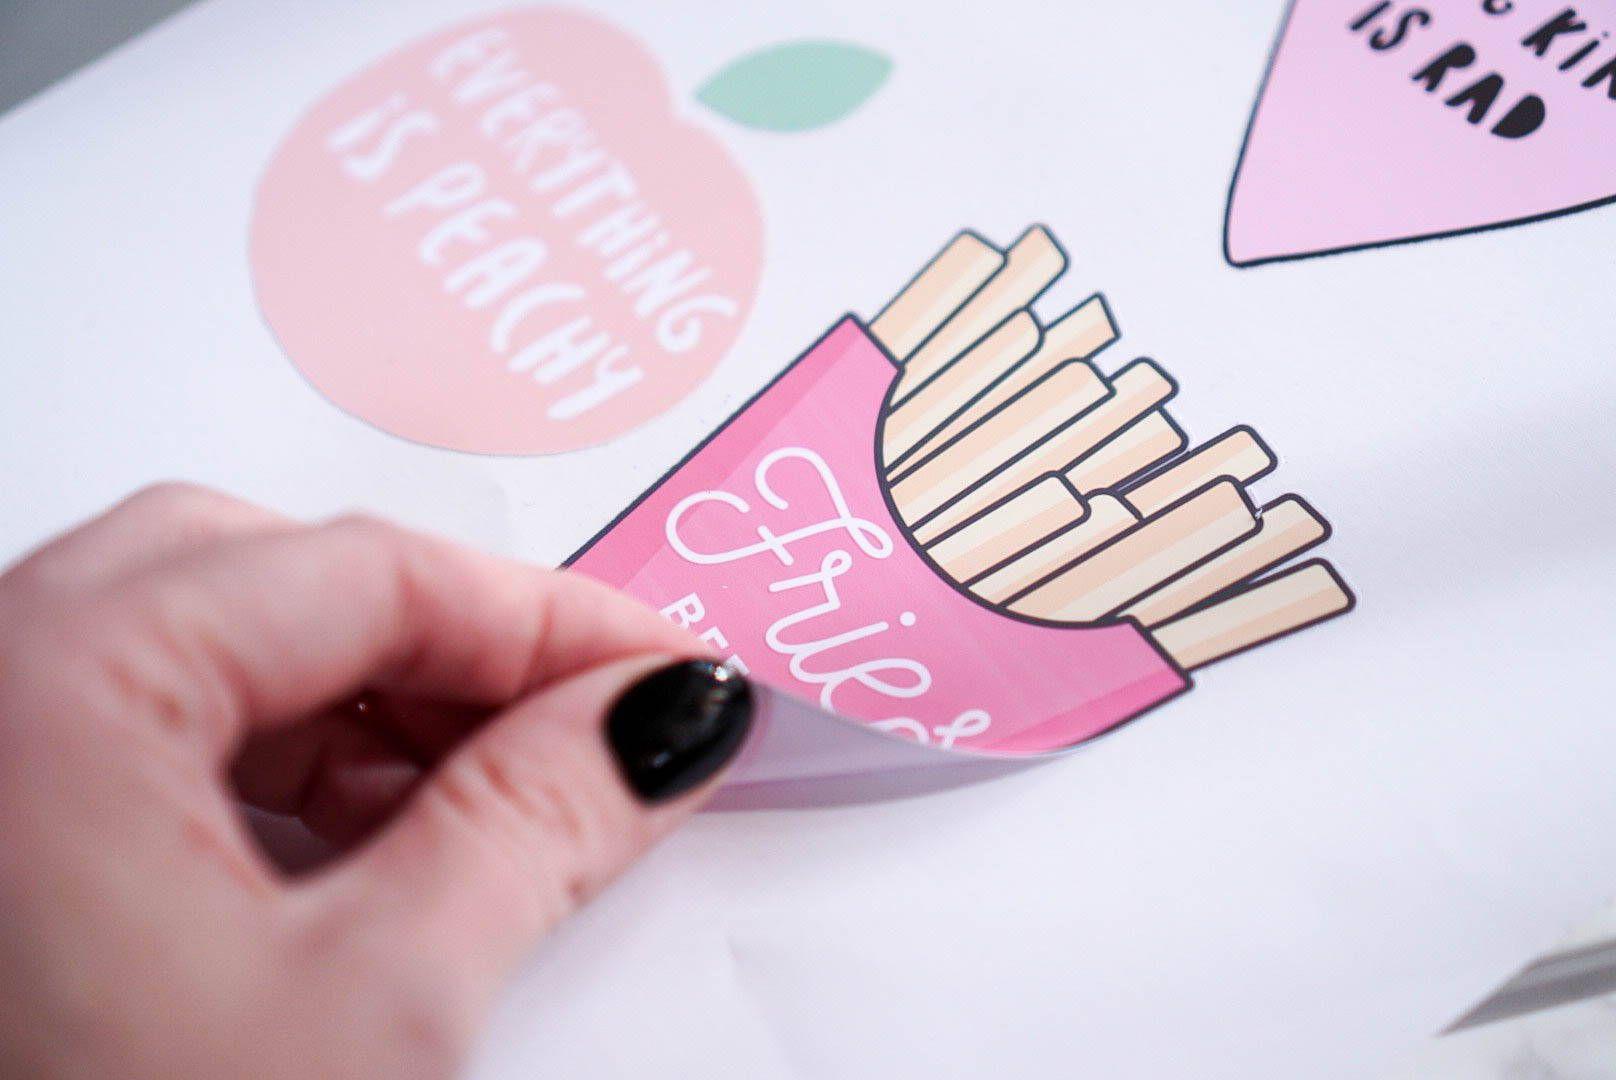 DIY Laptop Stickers Tutorial How to Use Inkjet Printable Adhesive Vinyl is part of Diy laptop, Laptop stickers, Laptop stickers diy, Laptop screen repair, Pink laptop, Computer skins - Learn how to print your own stickers using Inkjet Printable Adhesive Vinyl